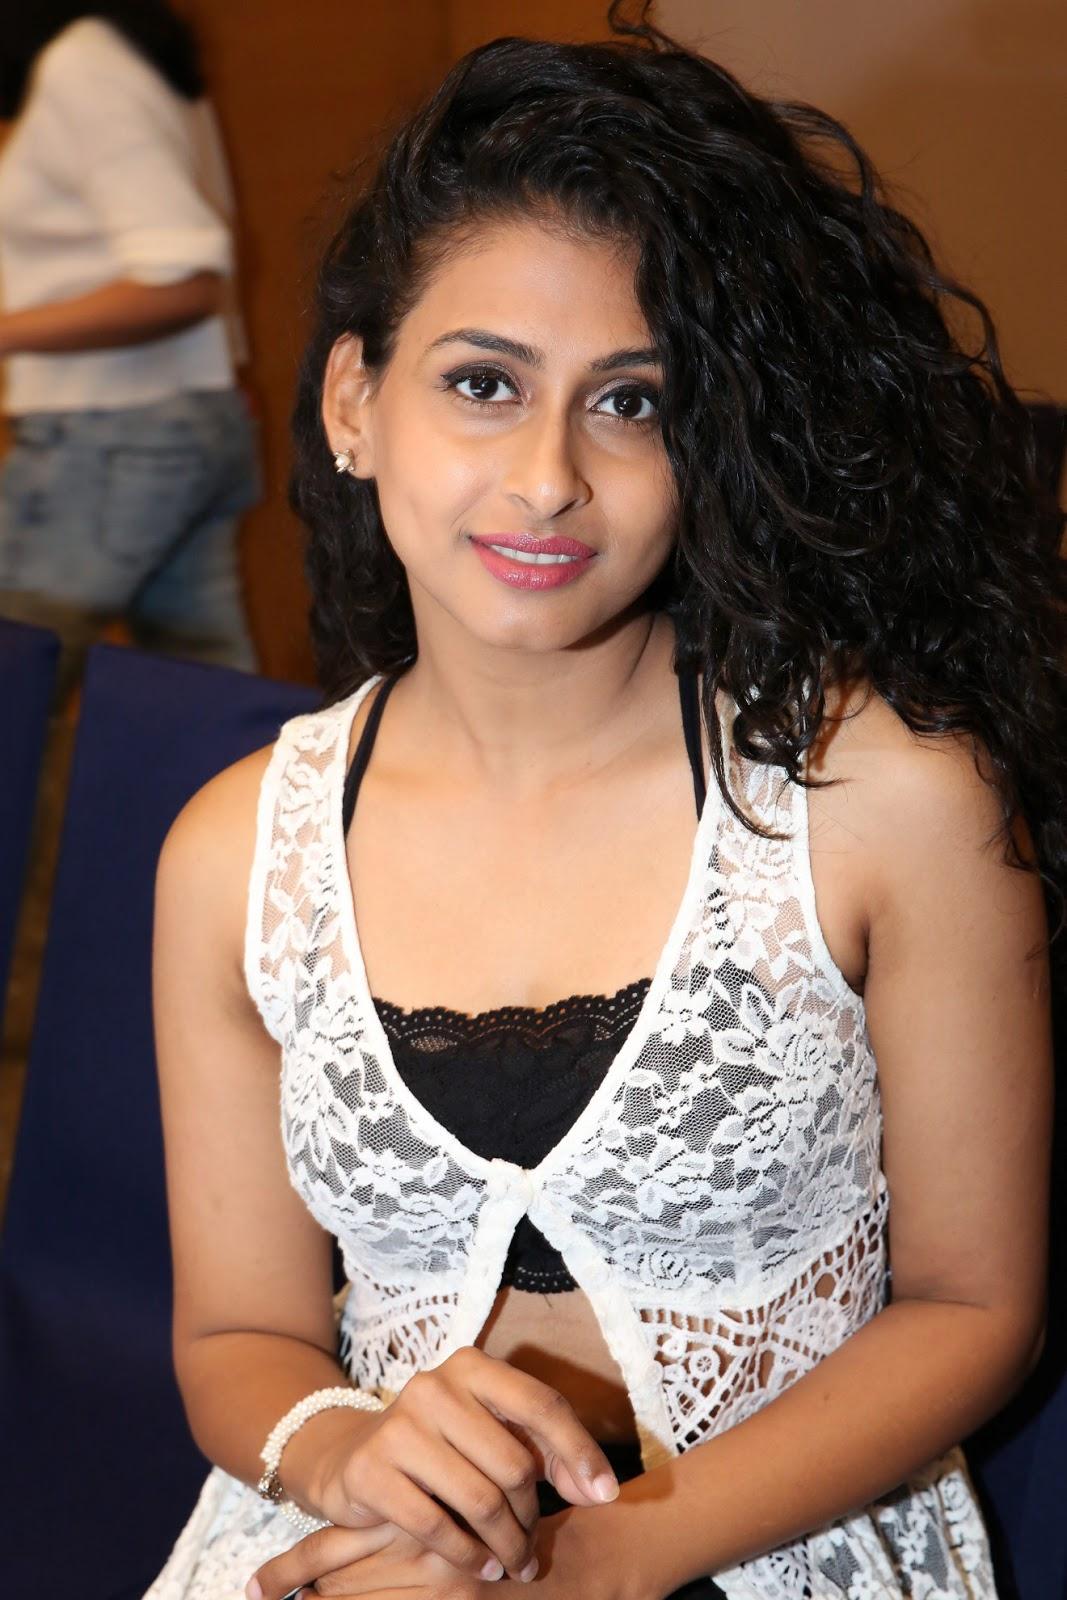 Nitya Naresh in Short Black Mini Skirt and Tank Top at Sutra Function